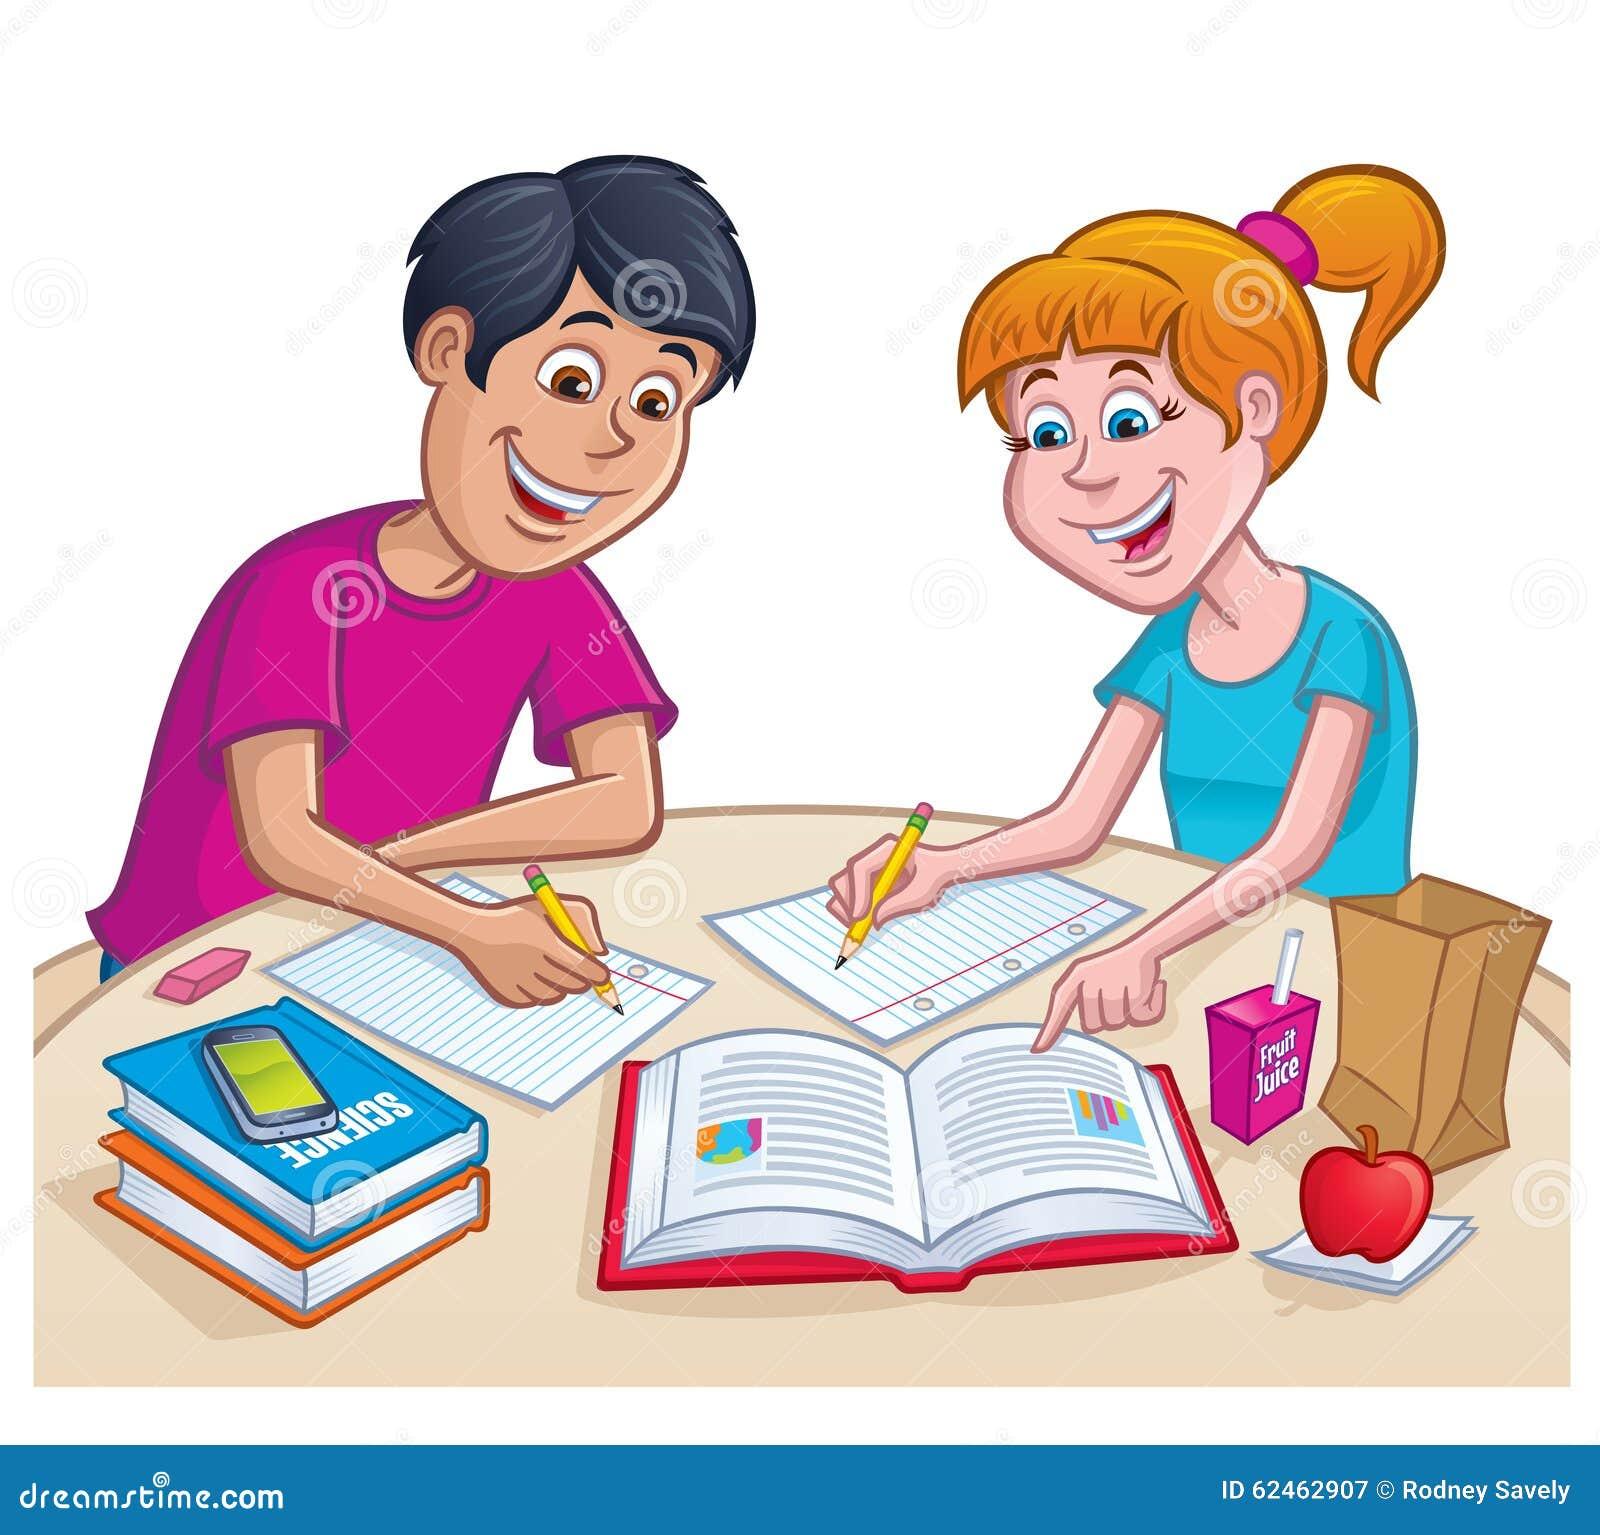 time for kids homework helper